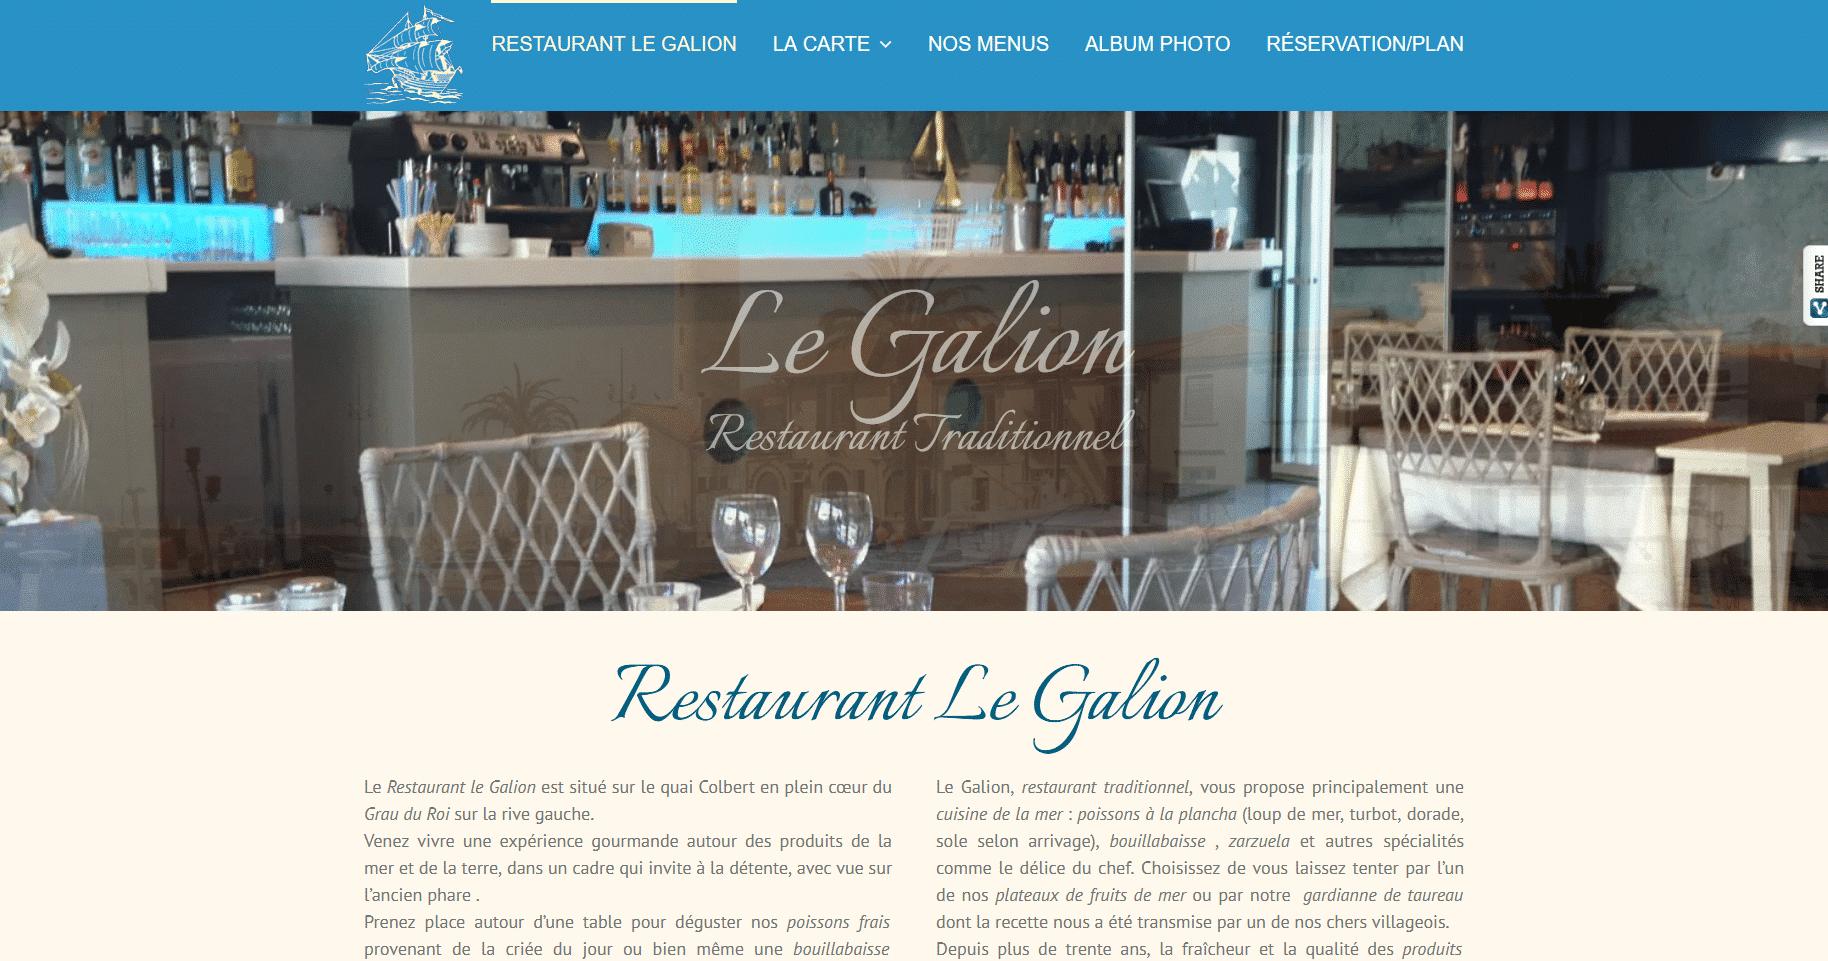 RESTAURANT LE GALION Restaurant Le Galion